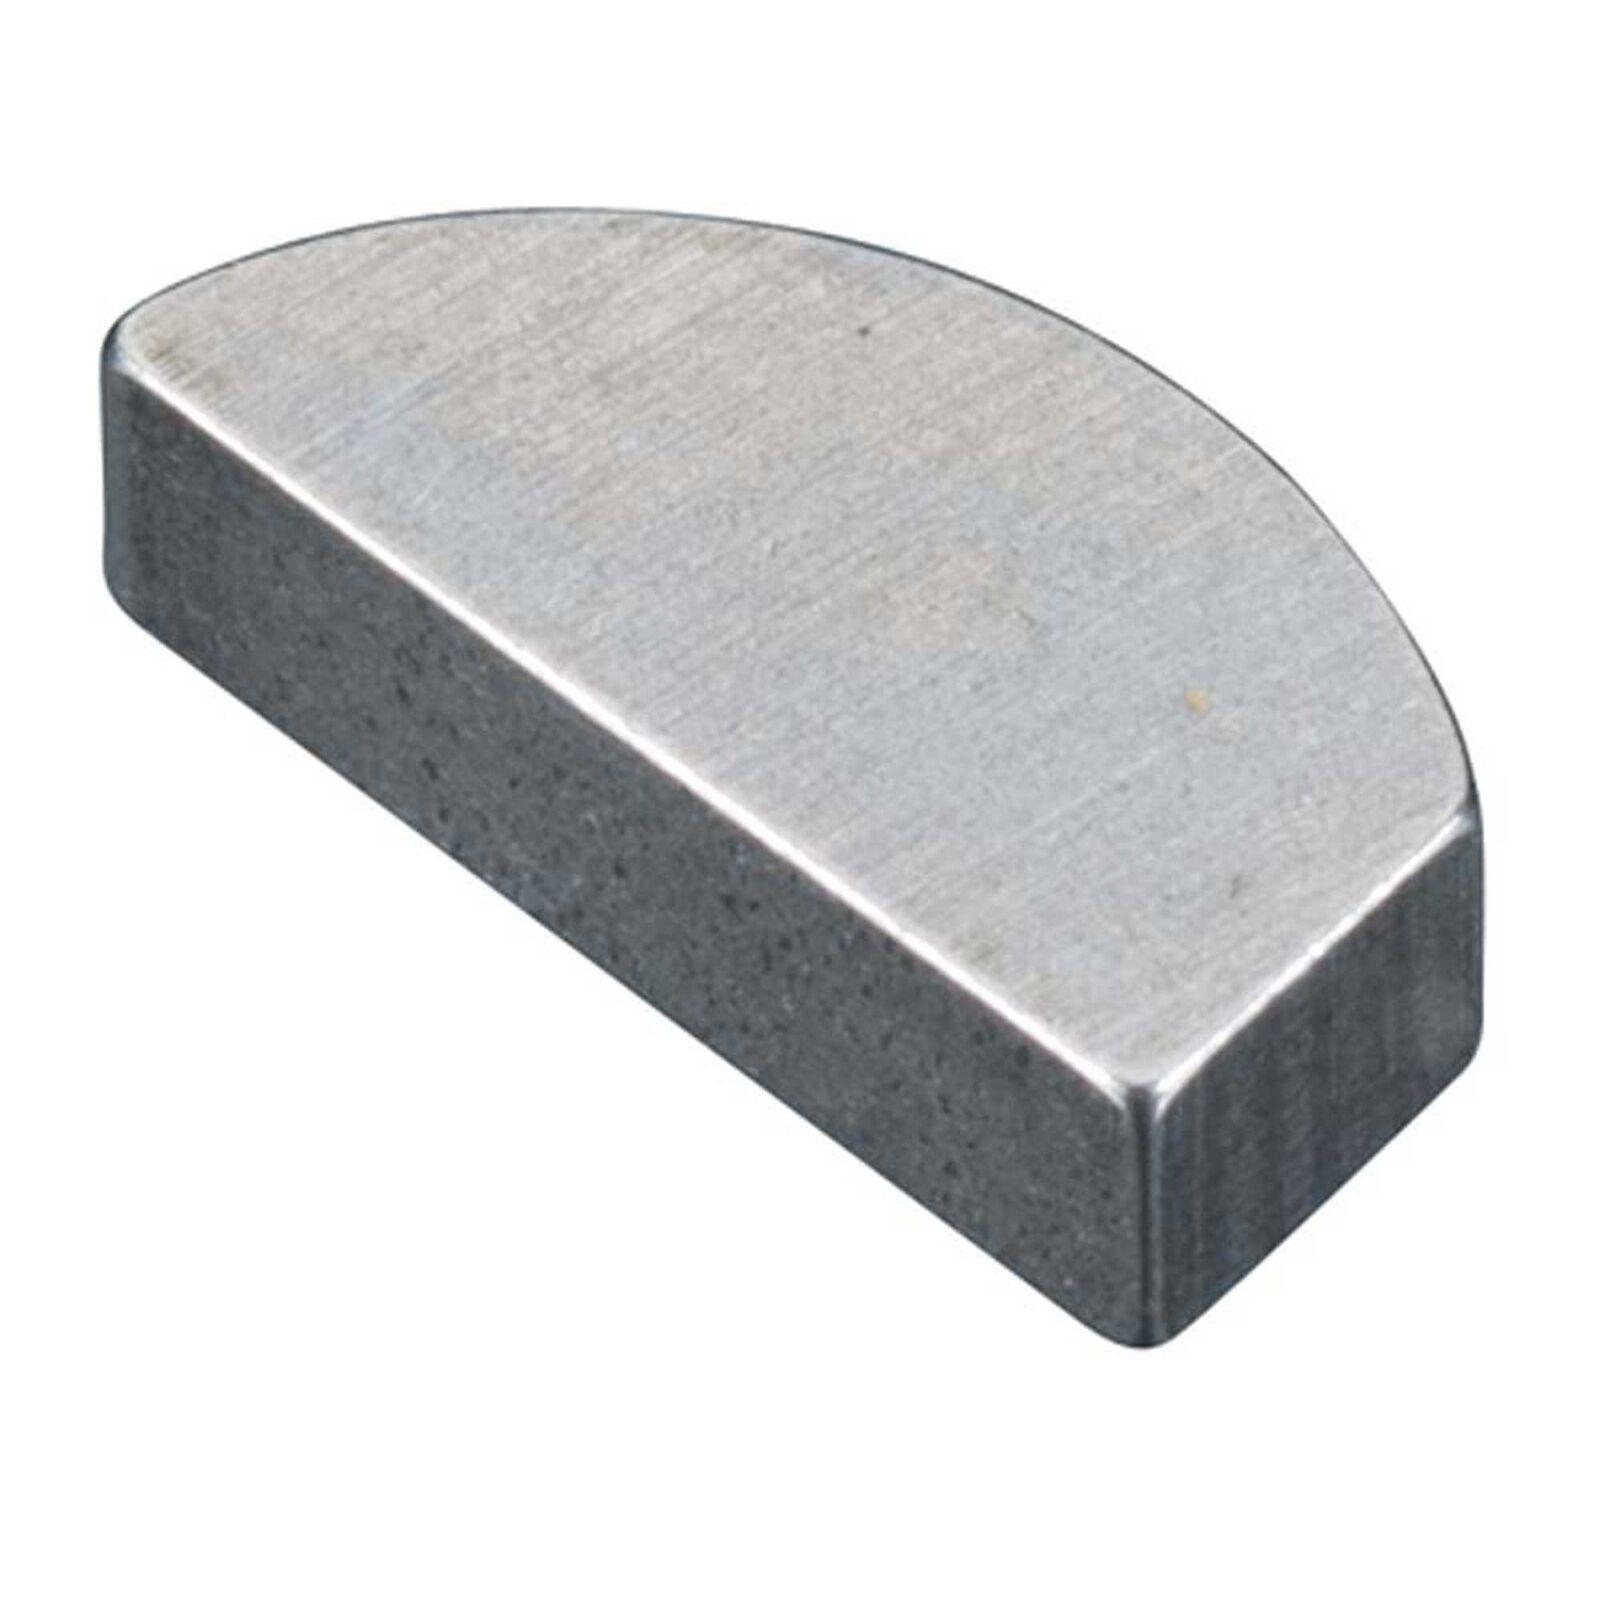 Woodruff Key: 61S RFH